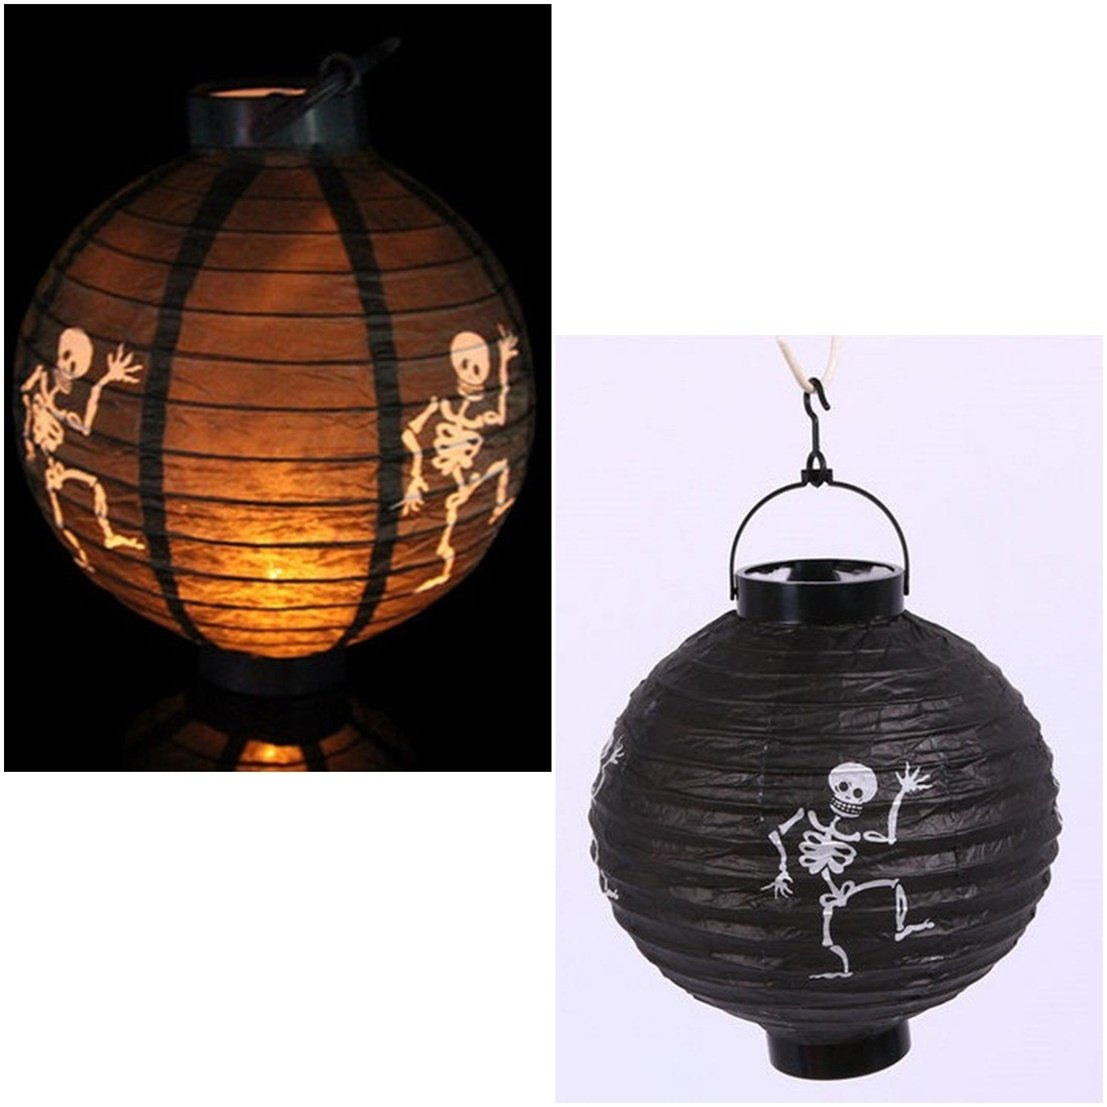 1 Pcs Professional Popular Halloween LED Nightlight Xmas Tree Paper Lantern Decoration Style Ghost Color Black